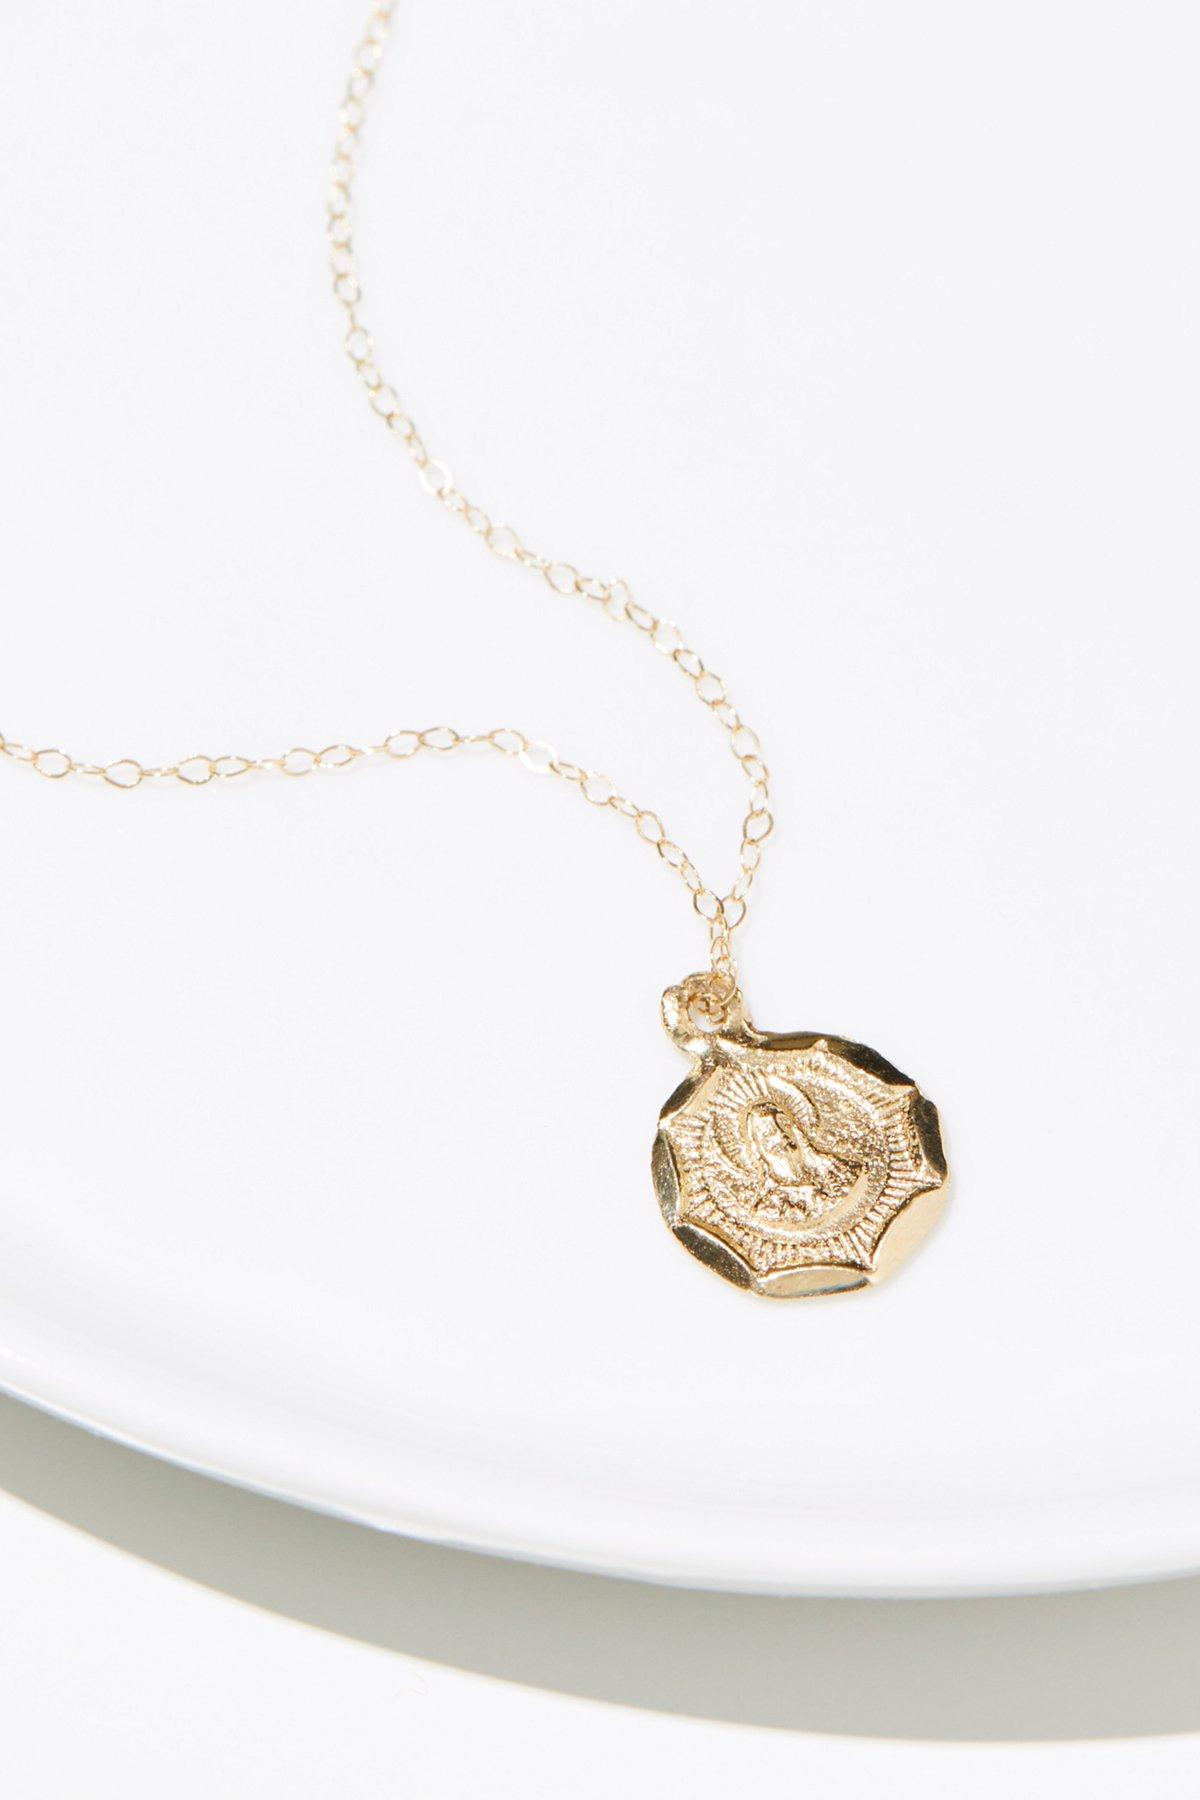 14K Vintage Charm Necklace